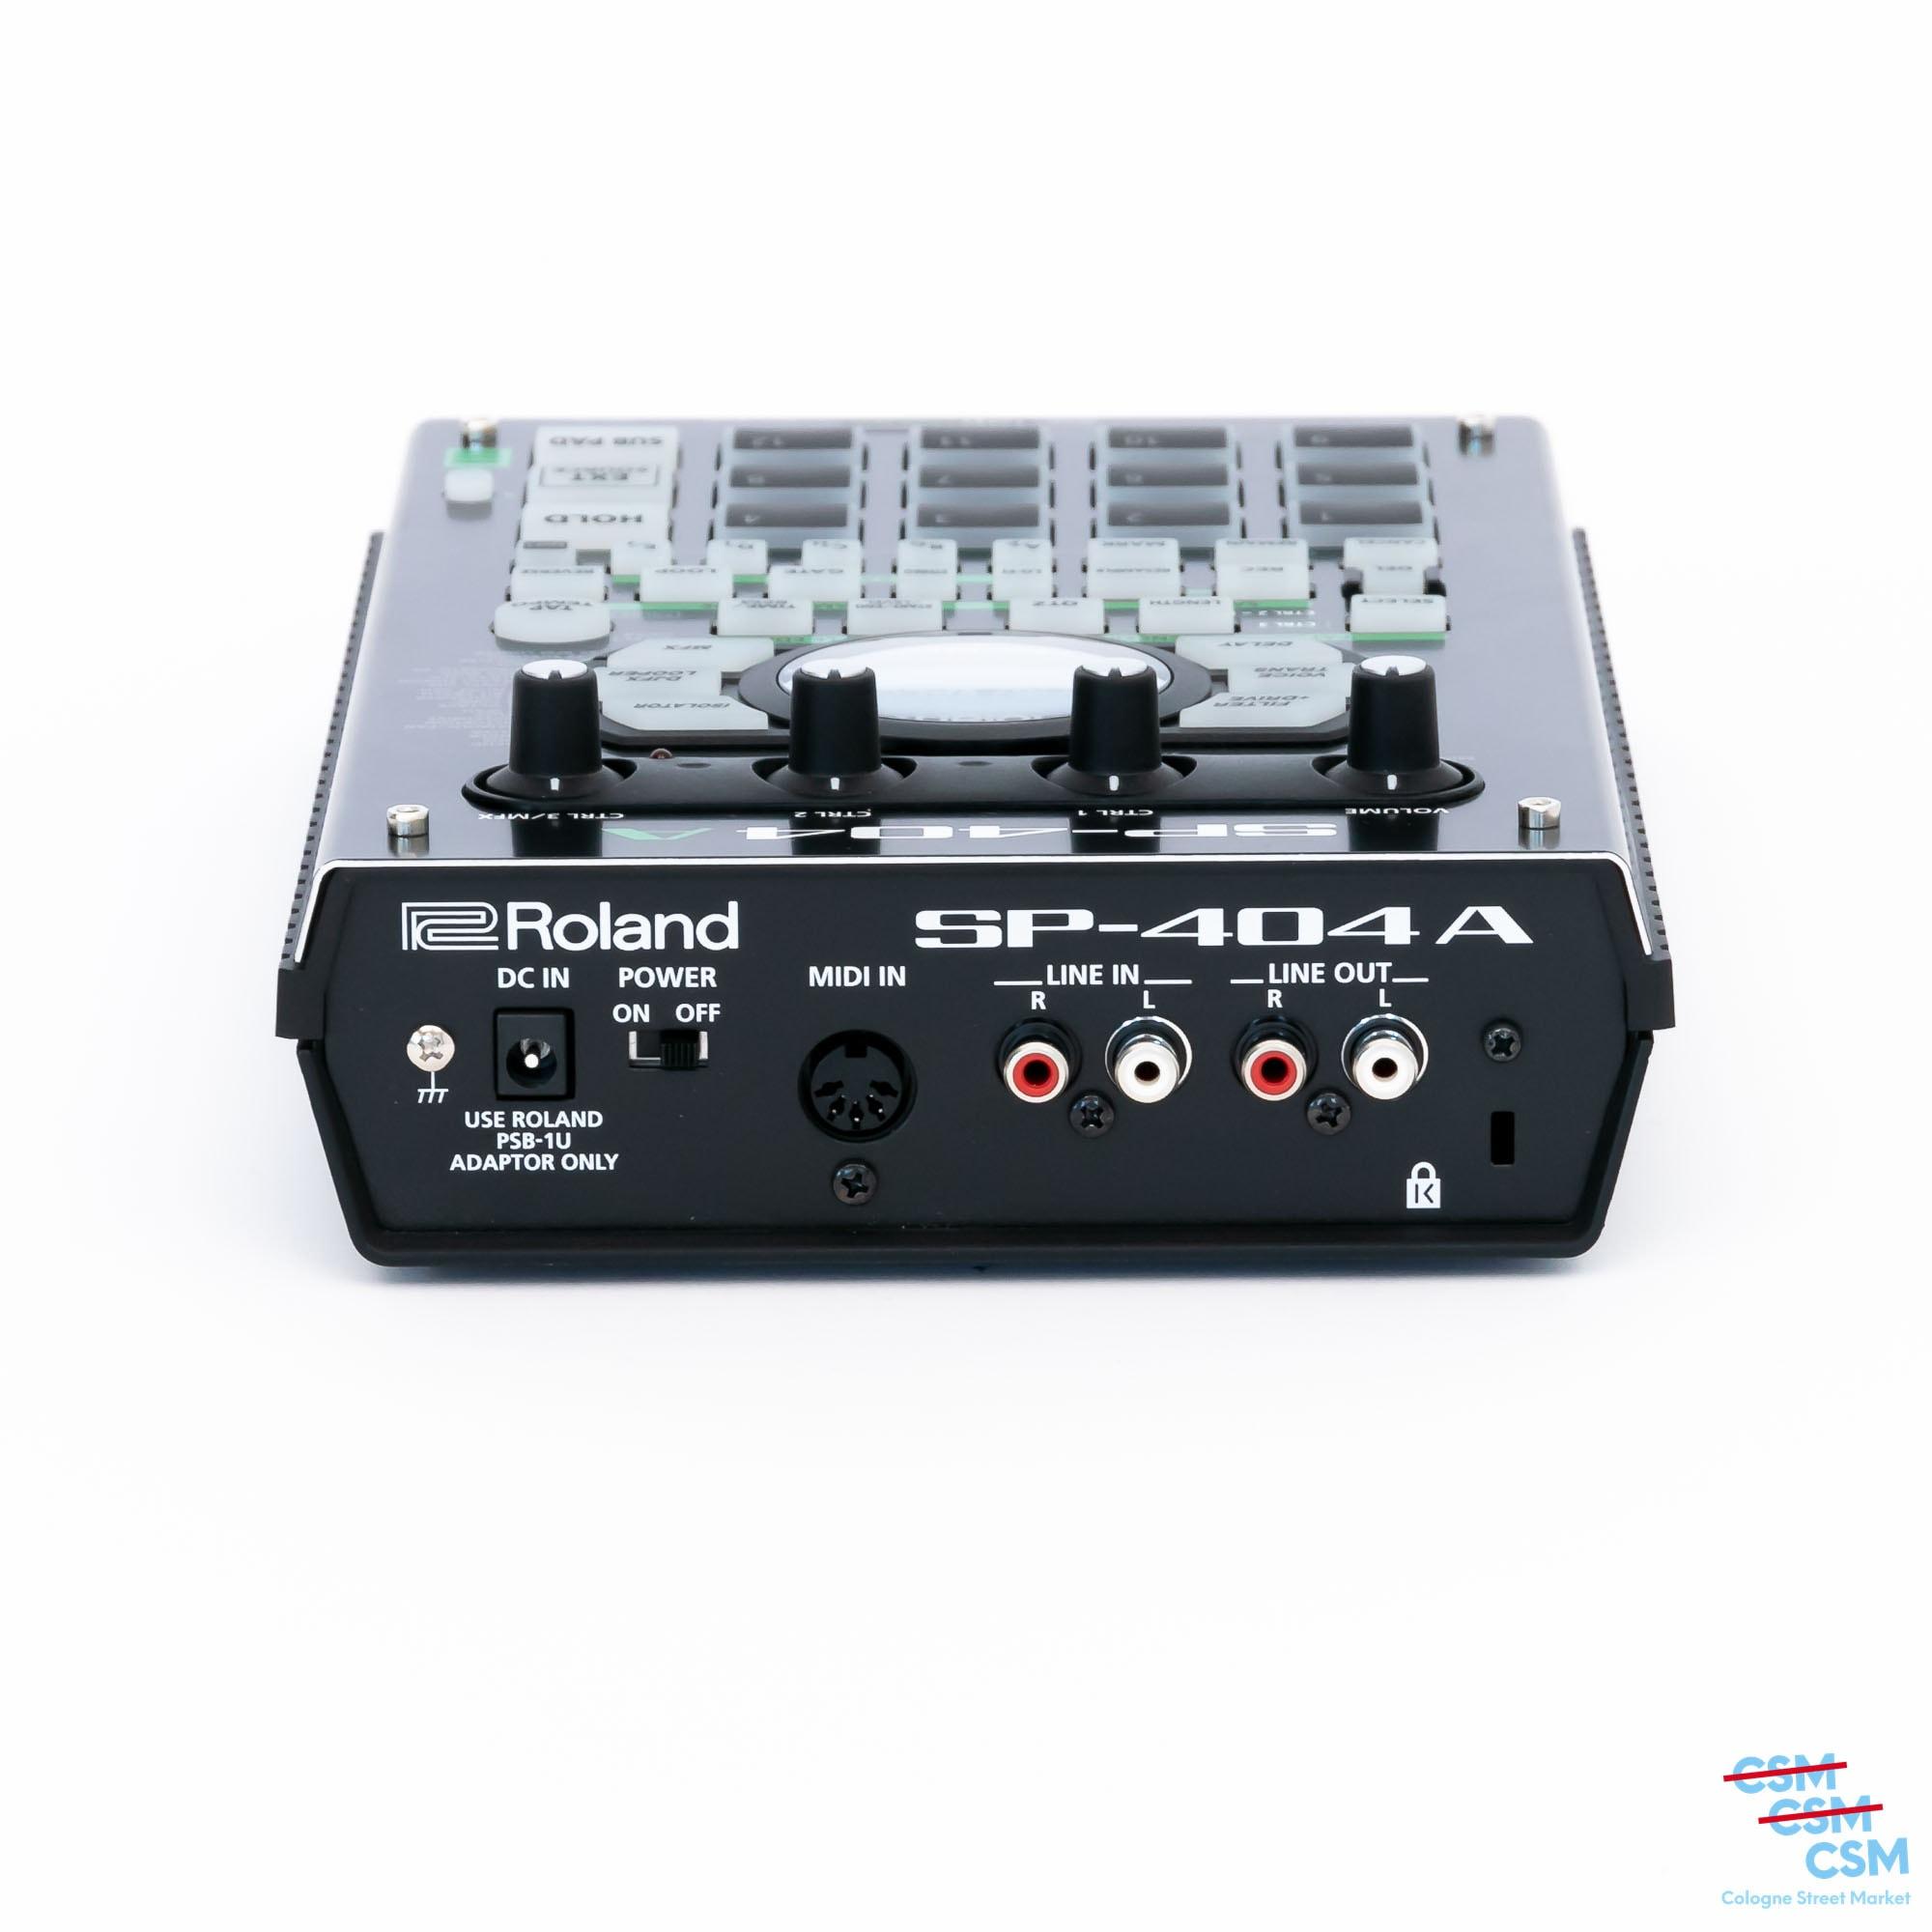 Roland-SP-404-A-gebraucht-11